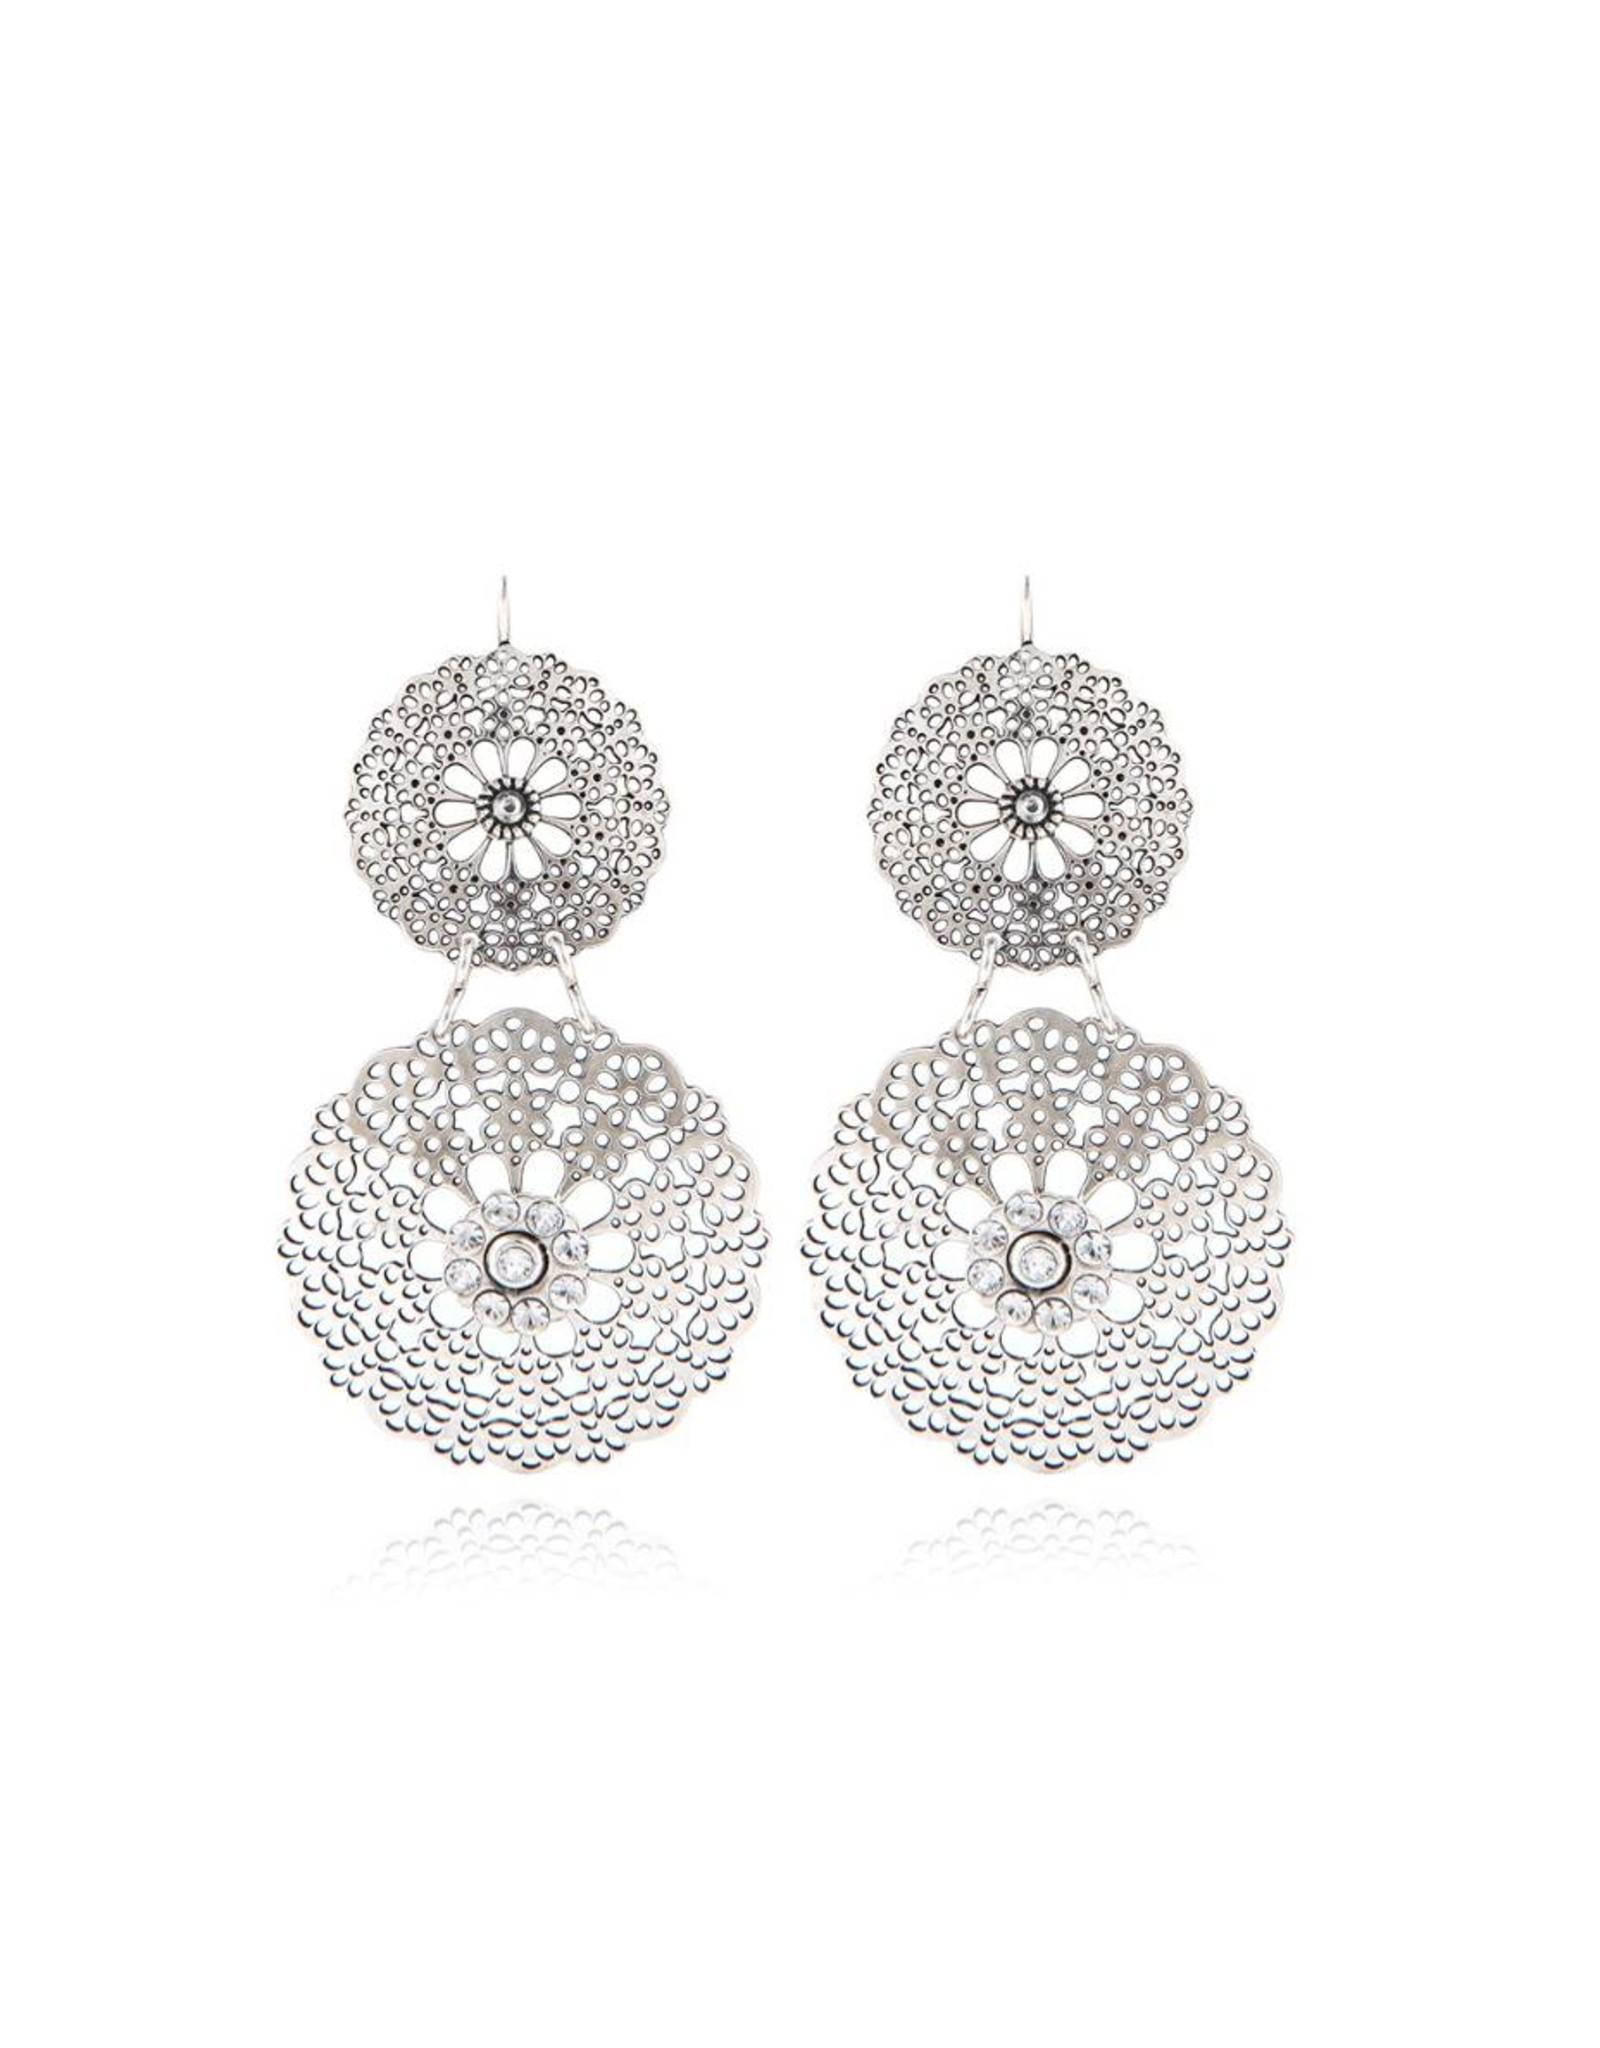 GAS Bijoux Earrings Flocon Double Silver PLated